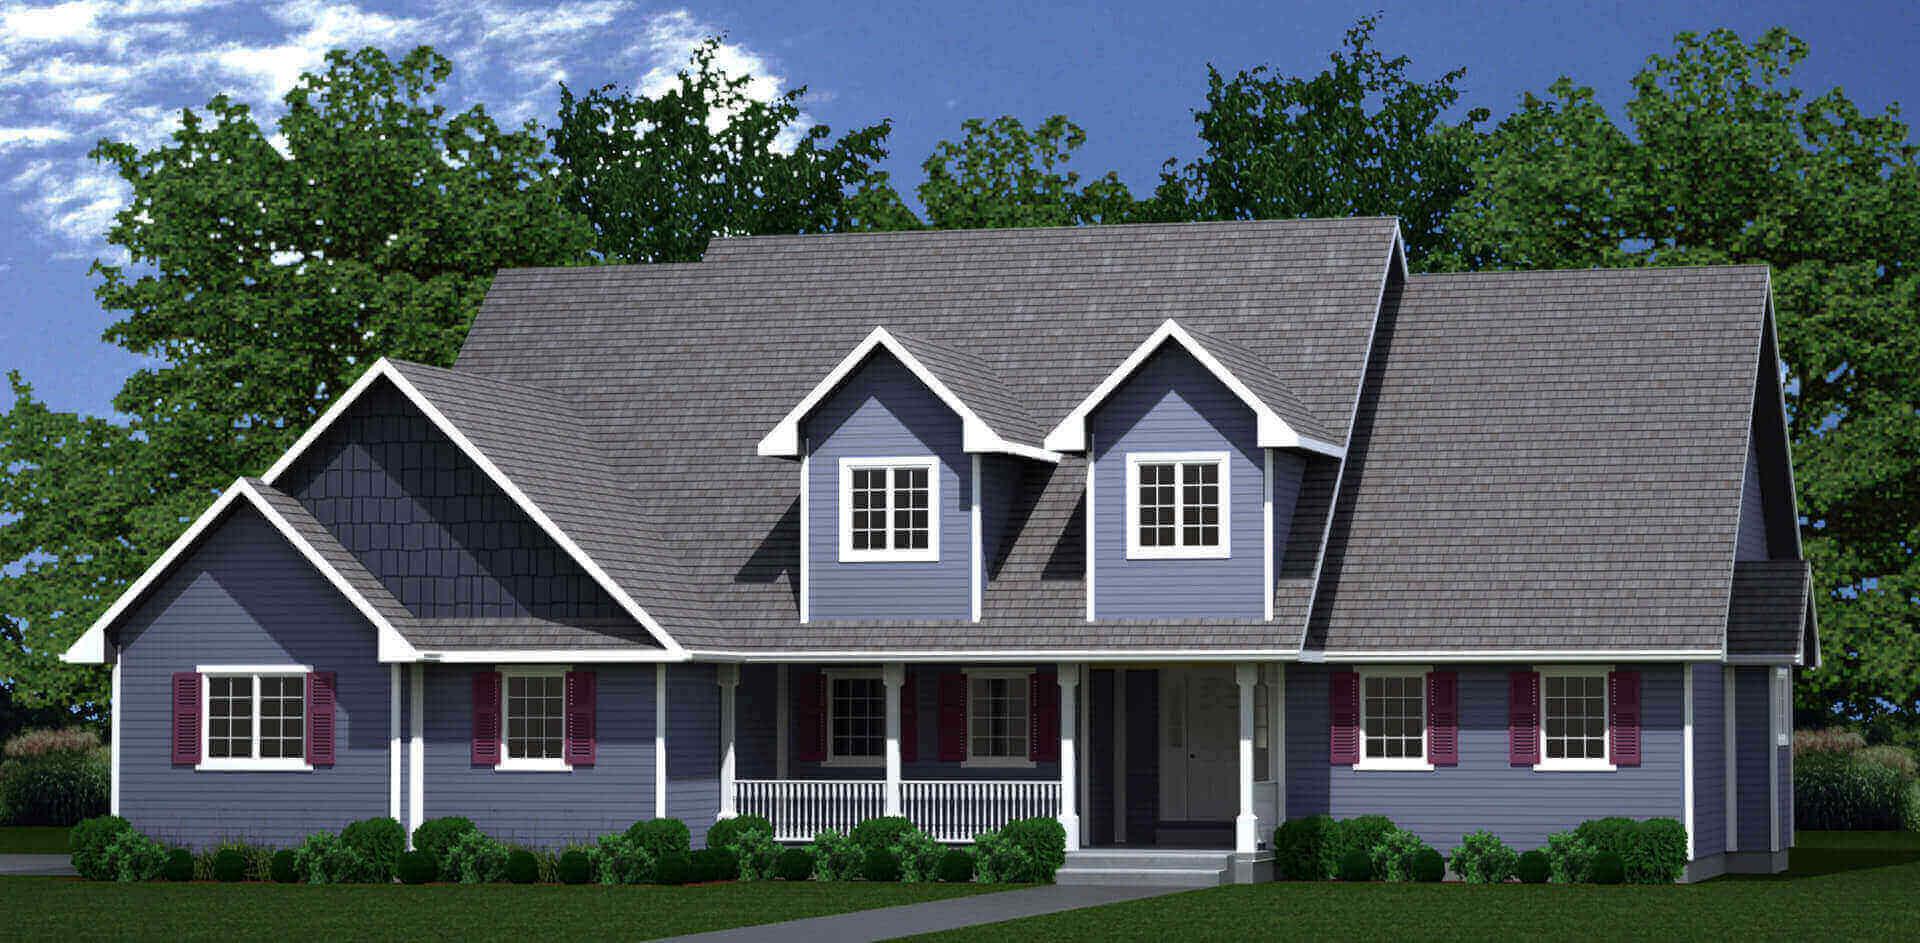 2446 house plan elevation